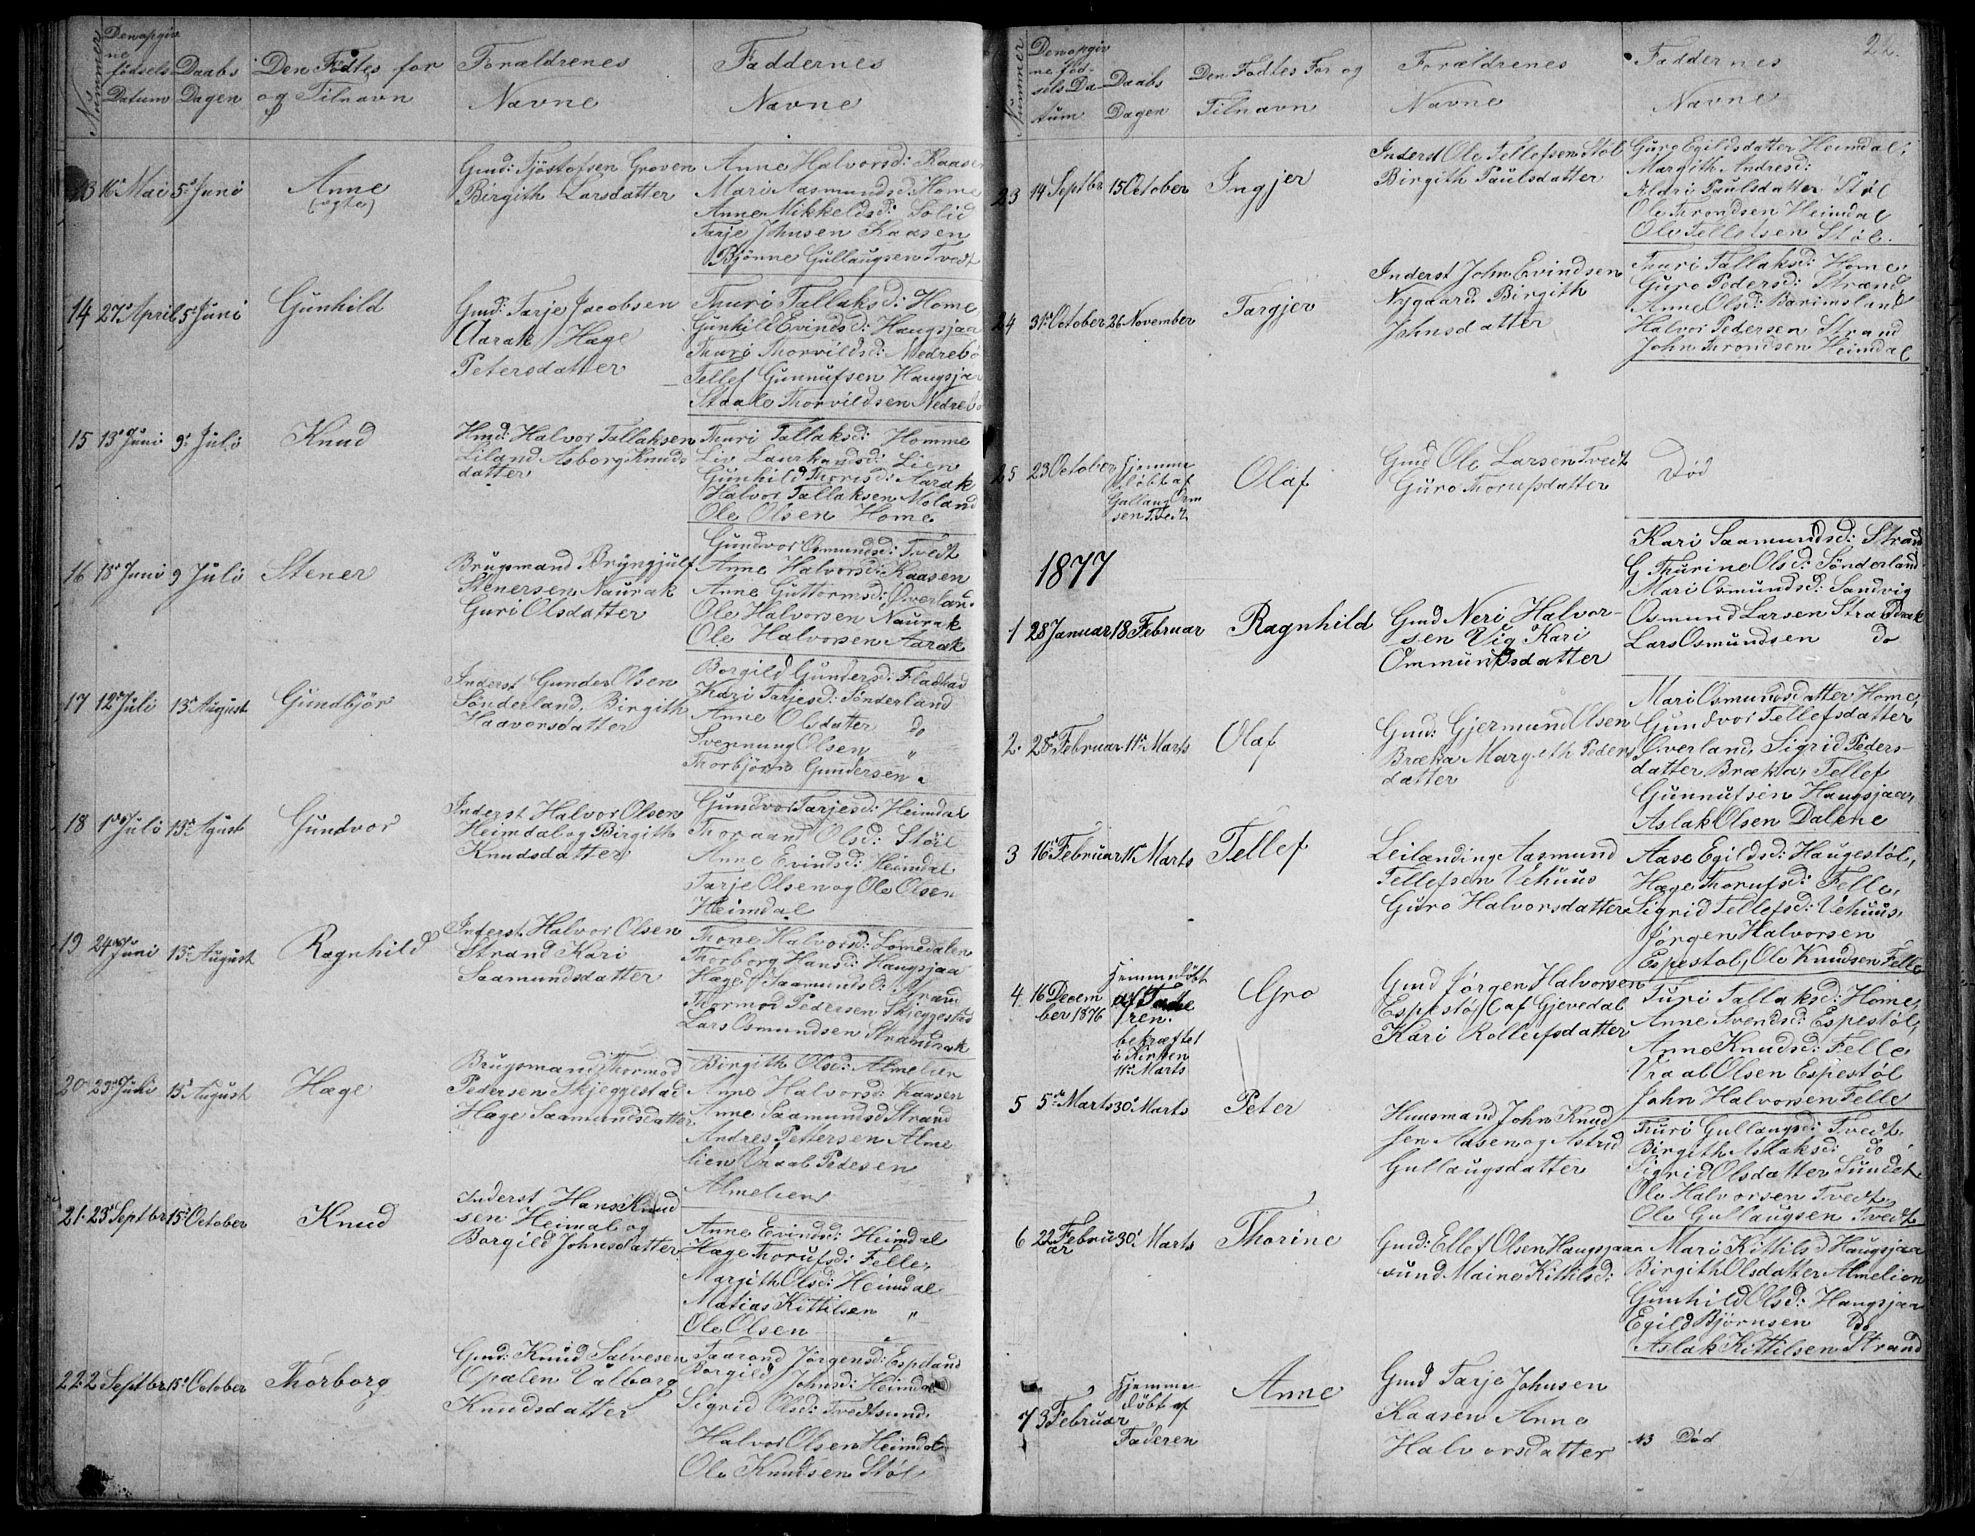 SAKO, Nissedal kirkebøker, G/Gb/L0002: Klokkerbok nr. II 2, 1863-1892, s. 22